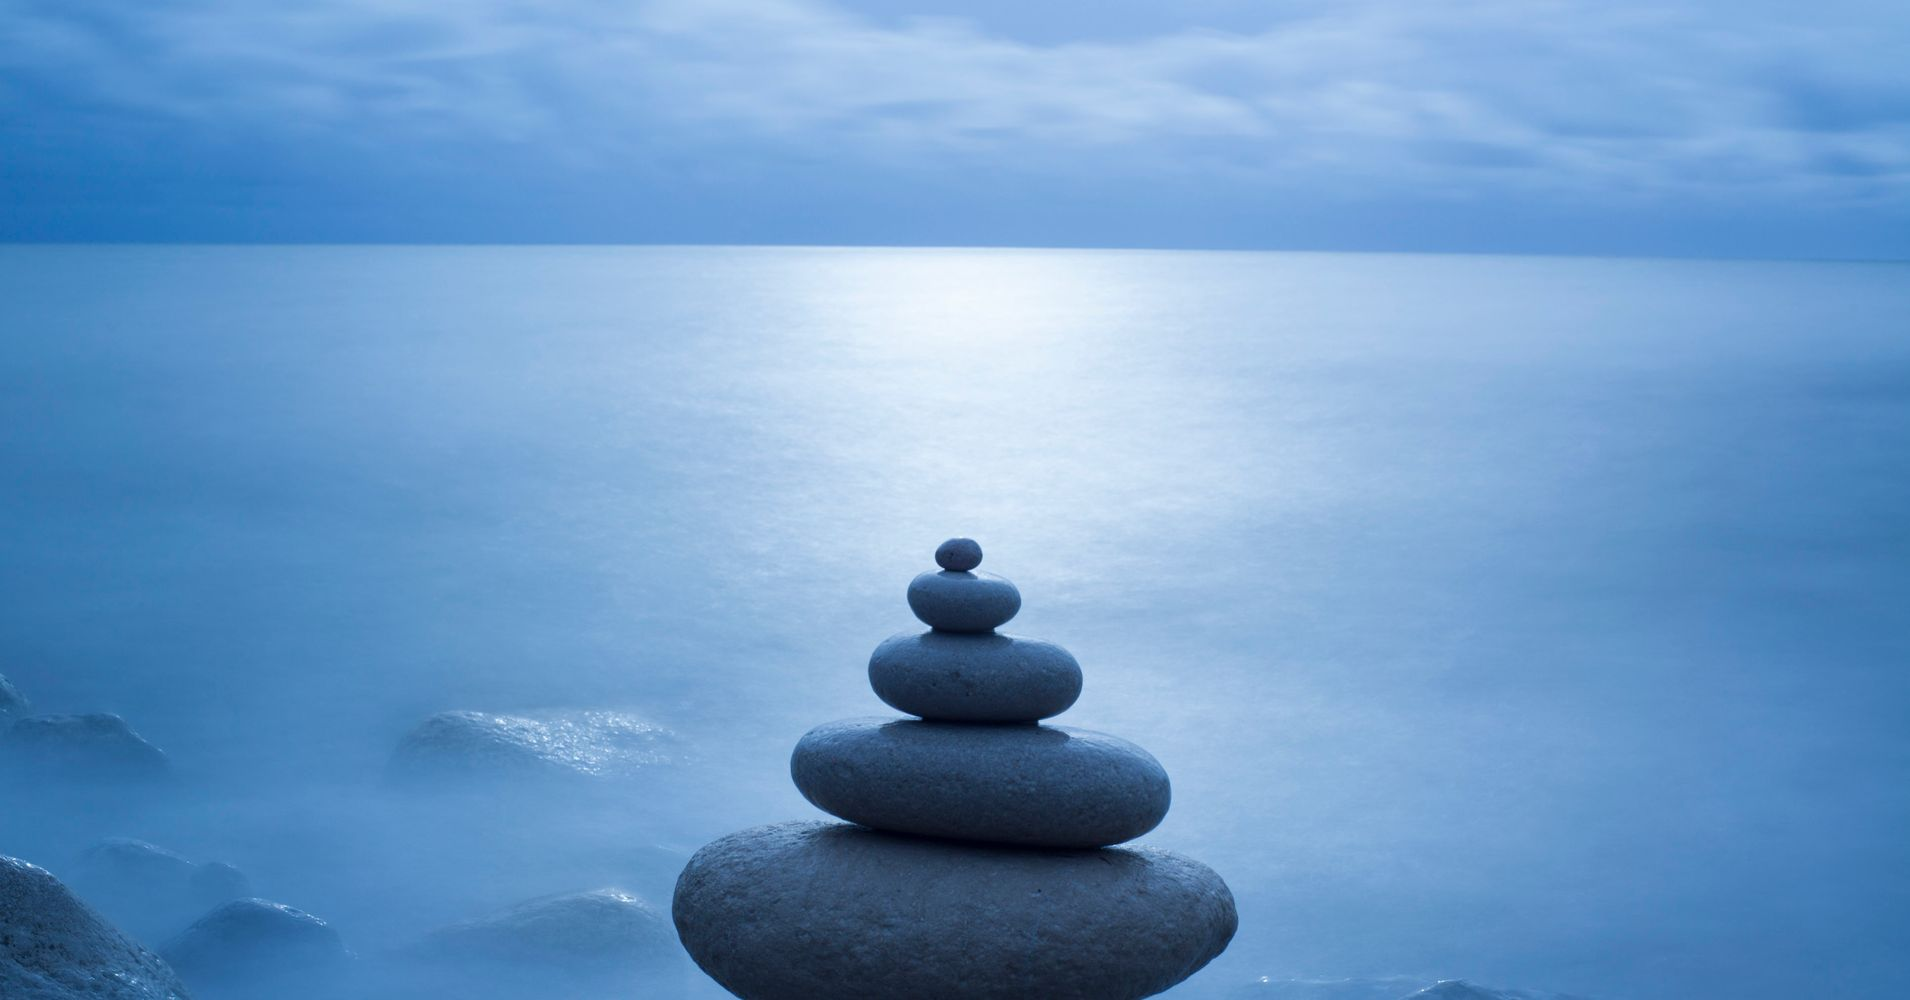 These Zen Buddhist Koans Will Open Your Mind | HuffPost